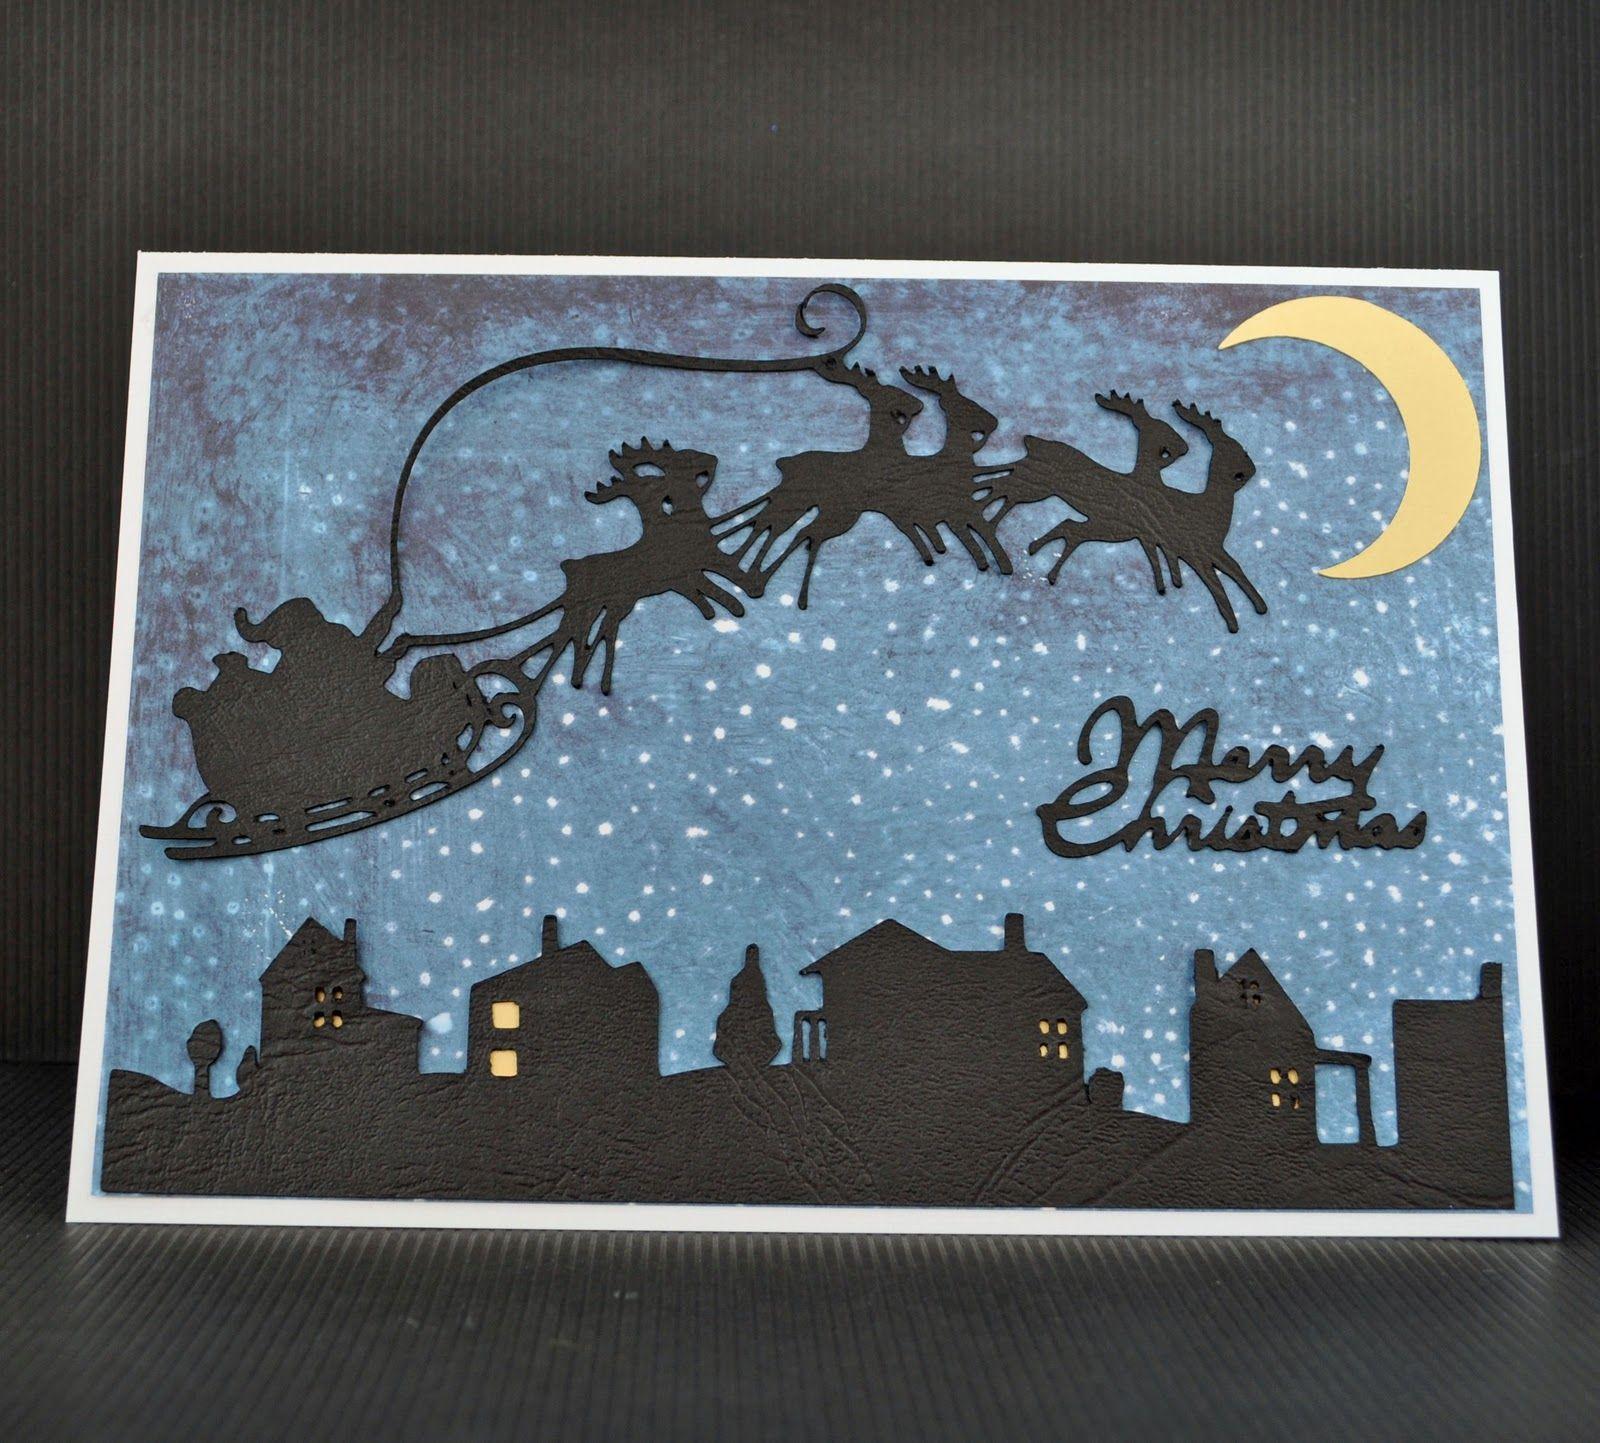 Pin by Saarha on Christmas Cards | Pinterest | Christmas Cards ...